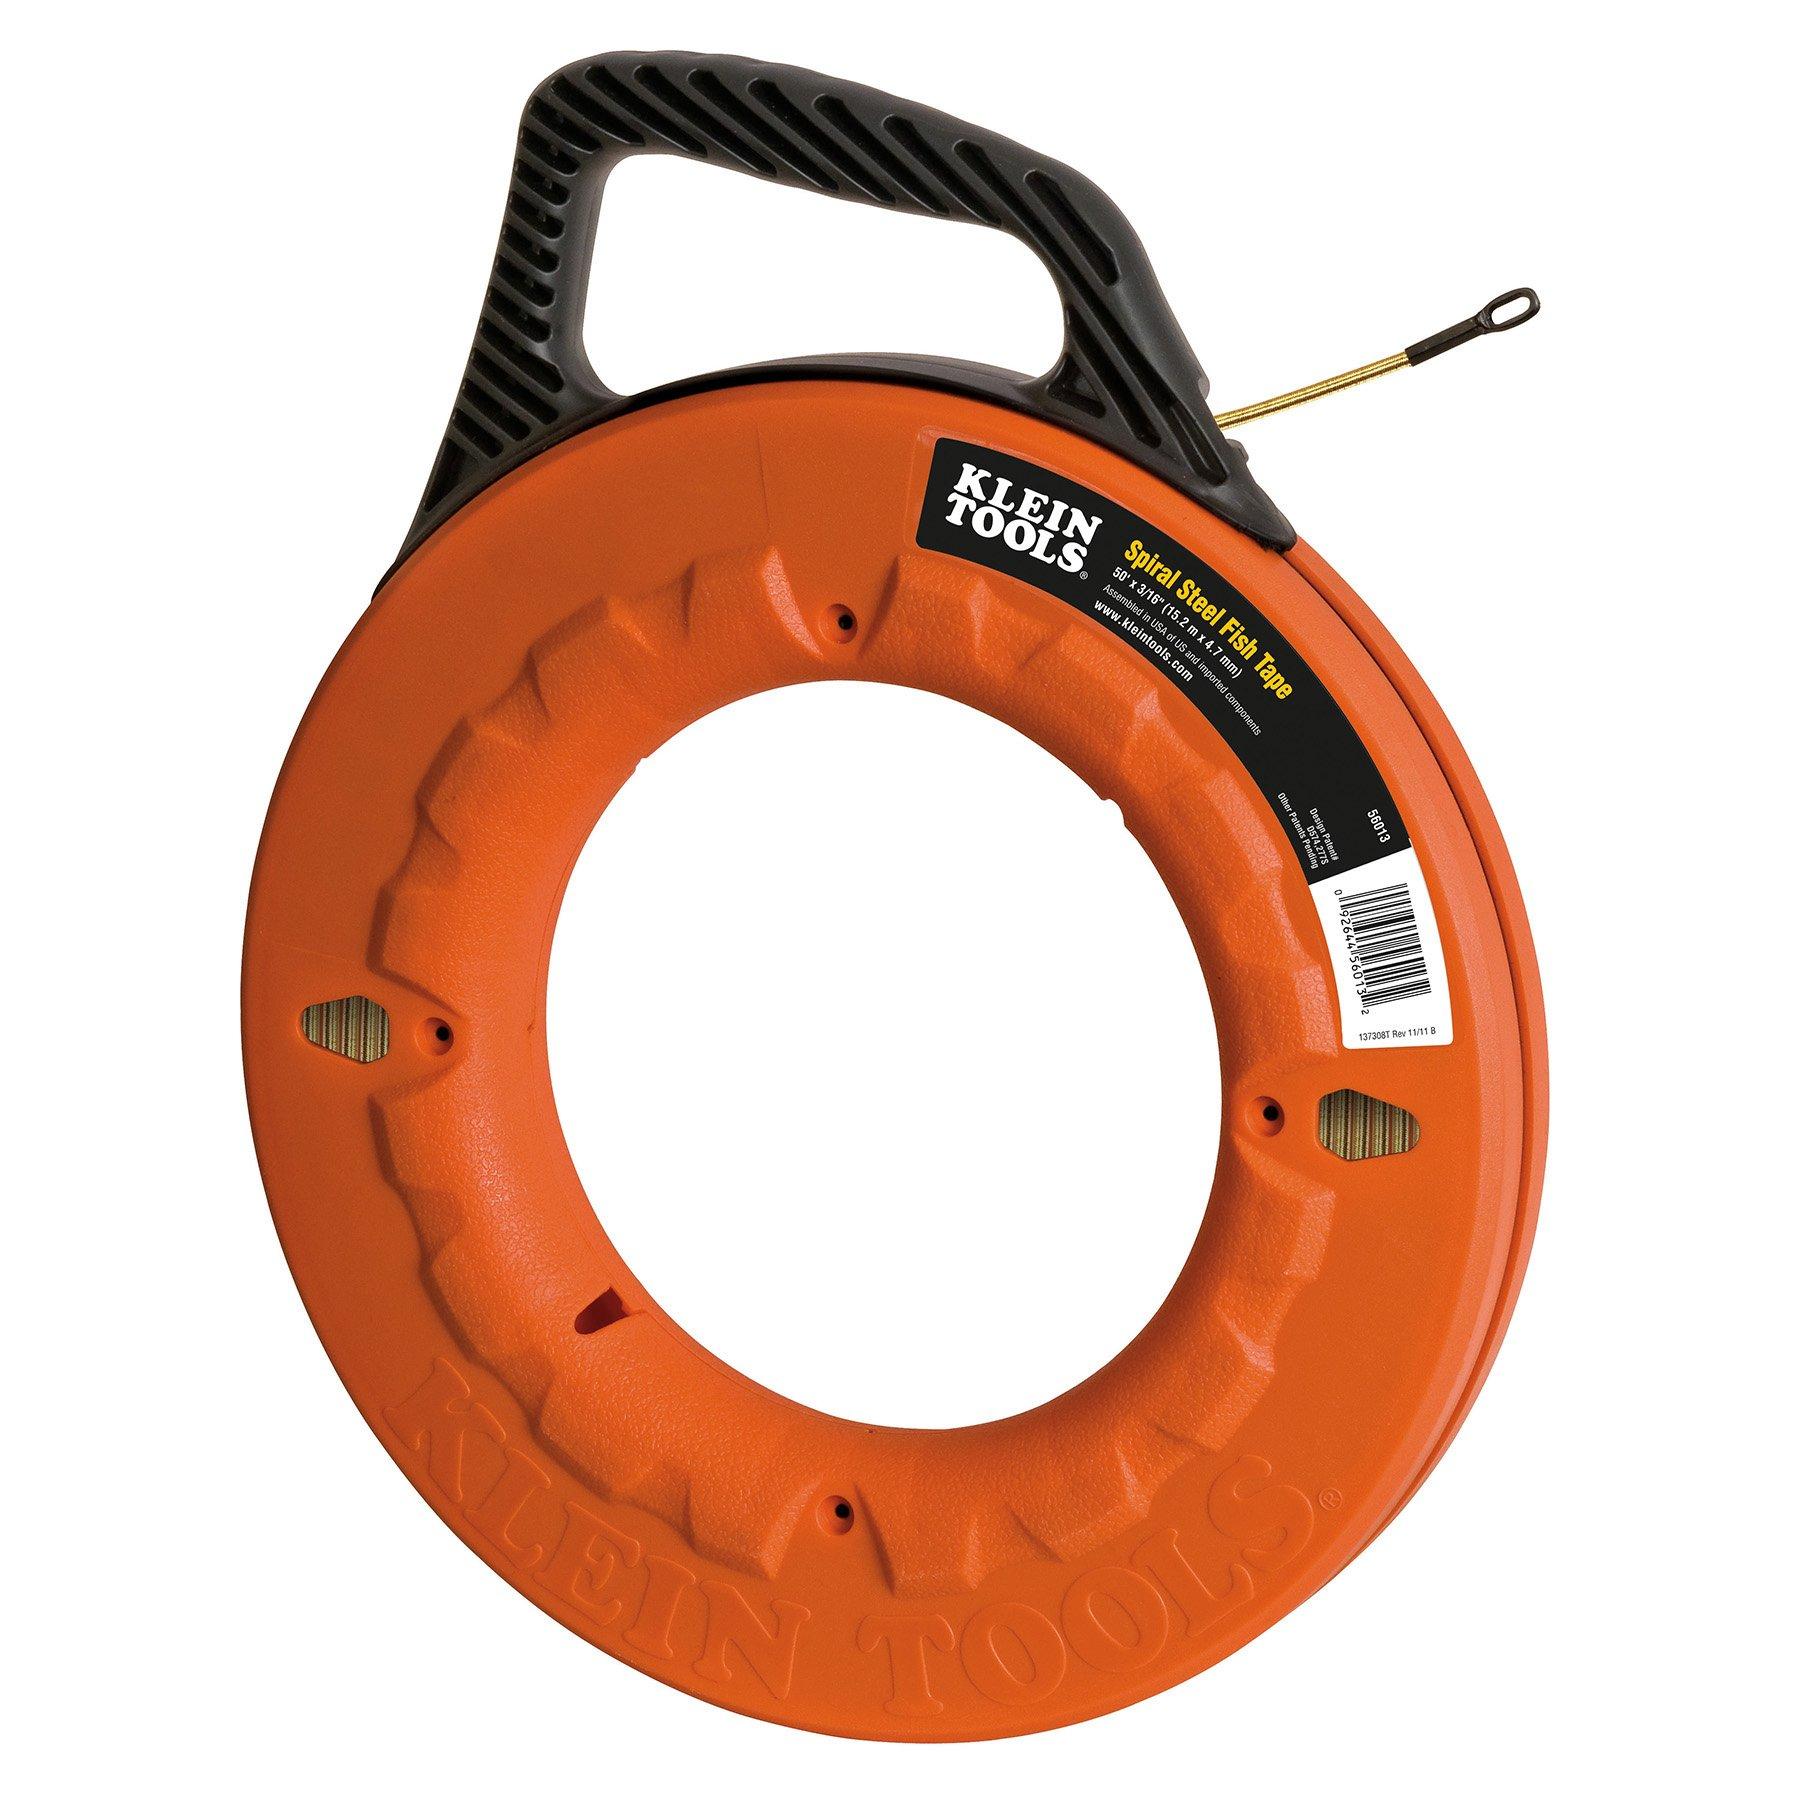 Klein Tools 56013 Navigator Spiral Steel Fish Tape, 50-Foot Length